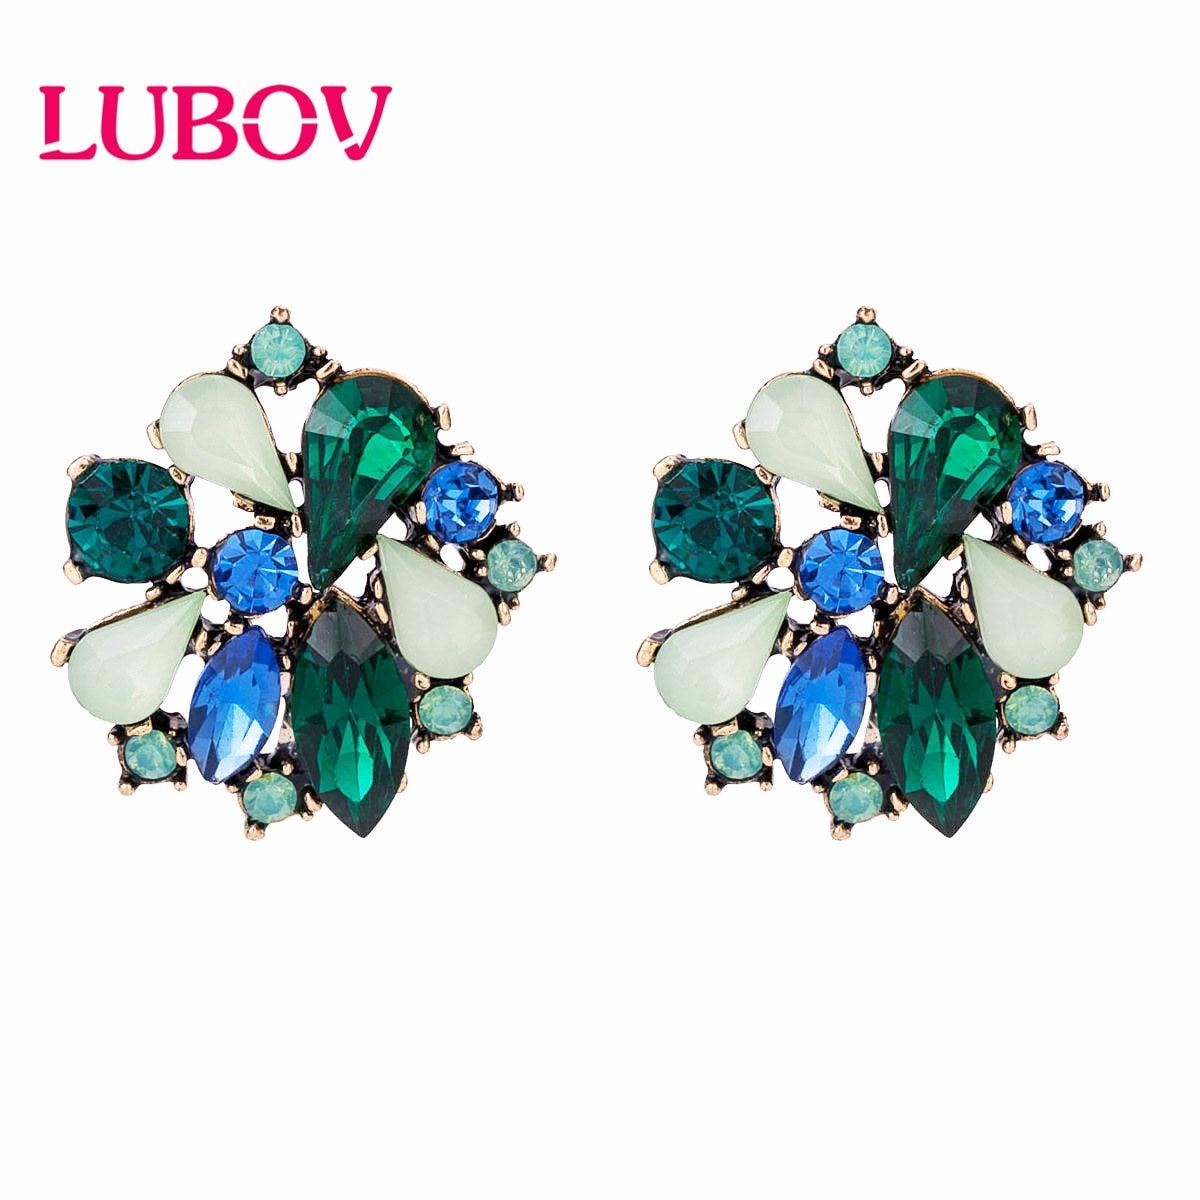 LUBOV Green colorful Flower Rhinestone Stud Earrings Anti Gold Color Piercing Earrings Trendy Women Wedding Party Jewelry